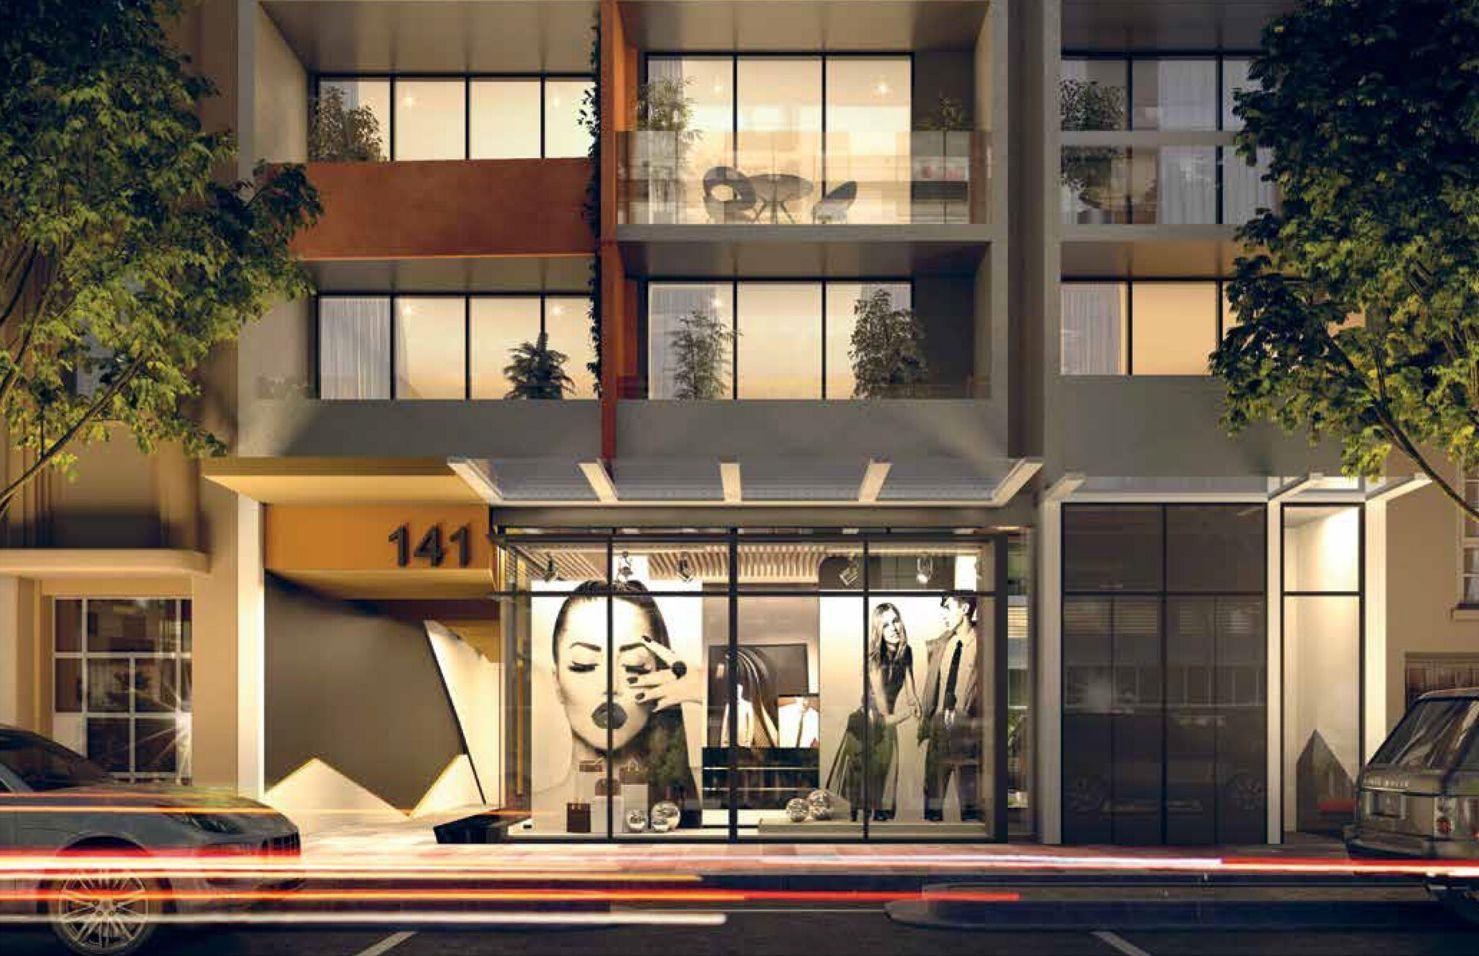 1403/141 La Trobe Street, Melbourne VIC 3000, Image 2